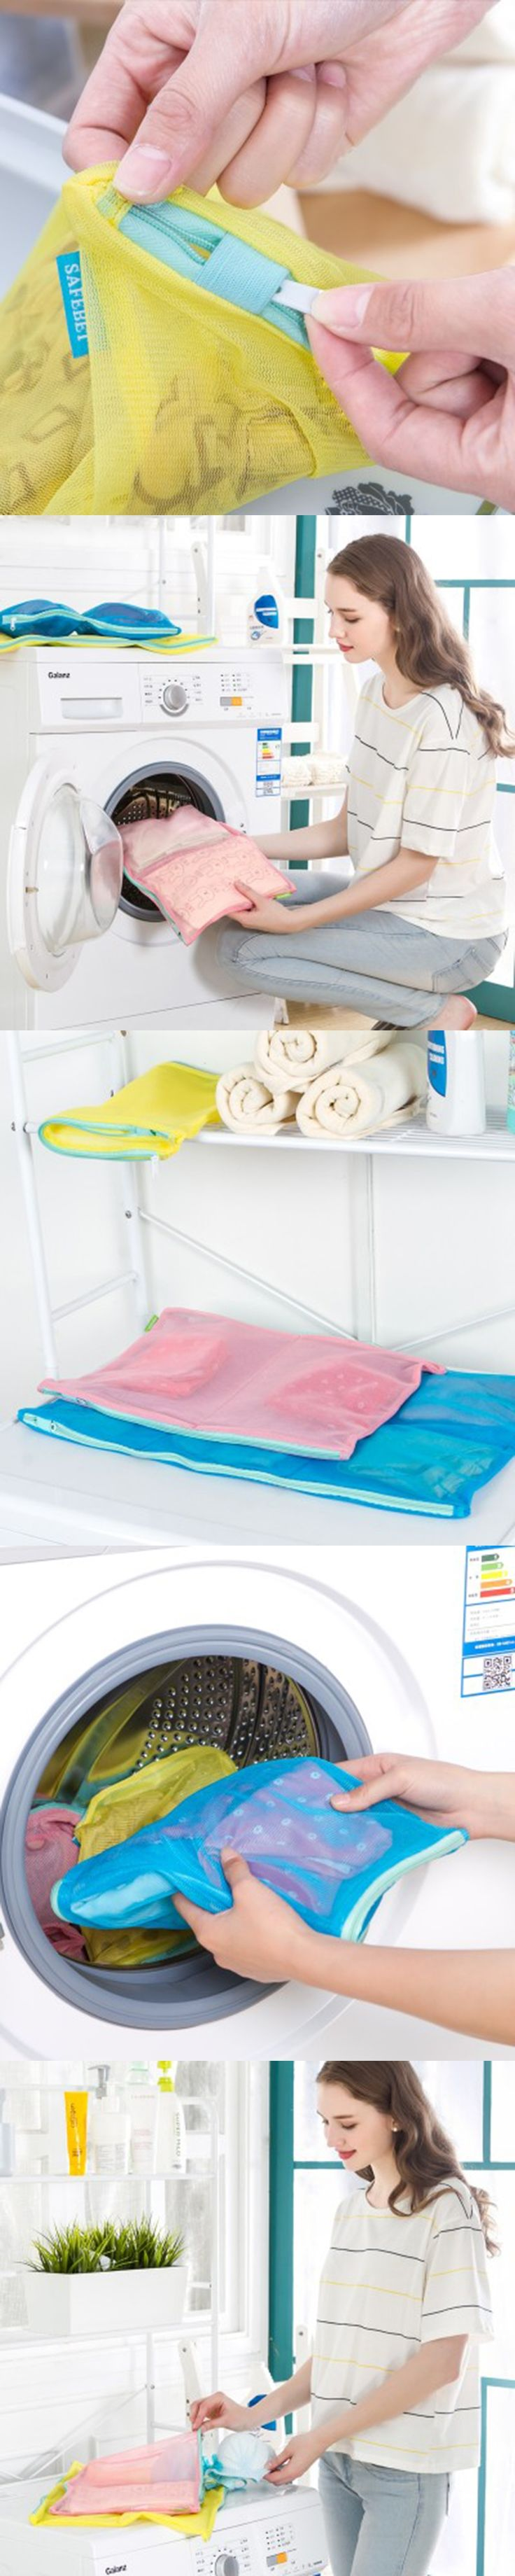 Laundry Saver Washing Machine Aid Bra Underwear Lingerie Mesh Wash Basket Bag into 8 Meshes Separate Washing Protector Clothing